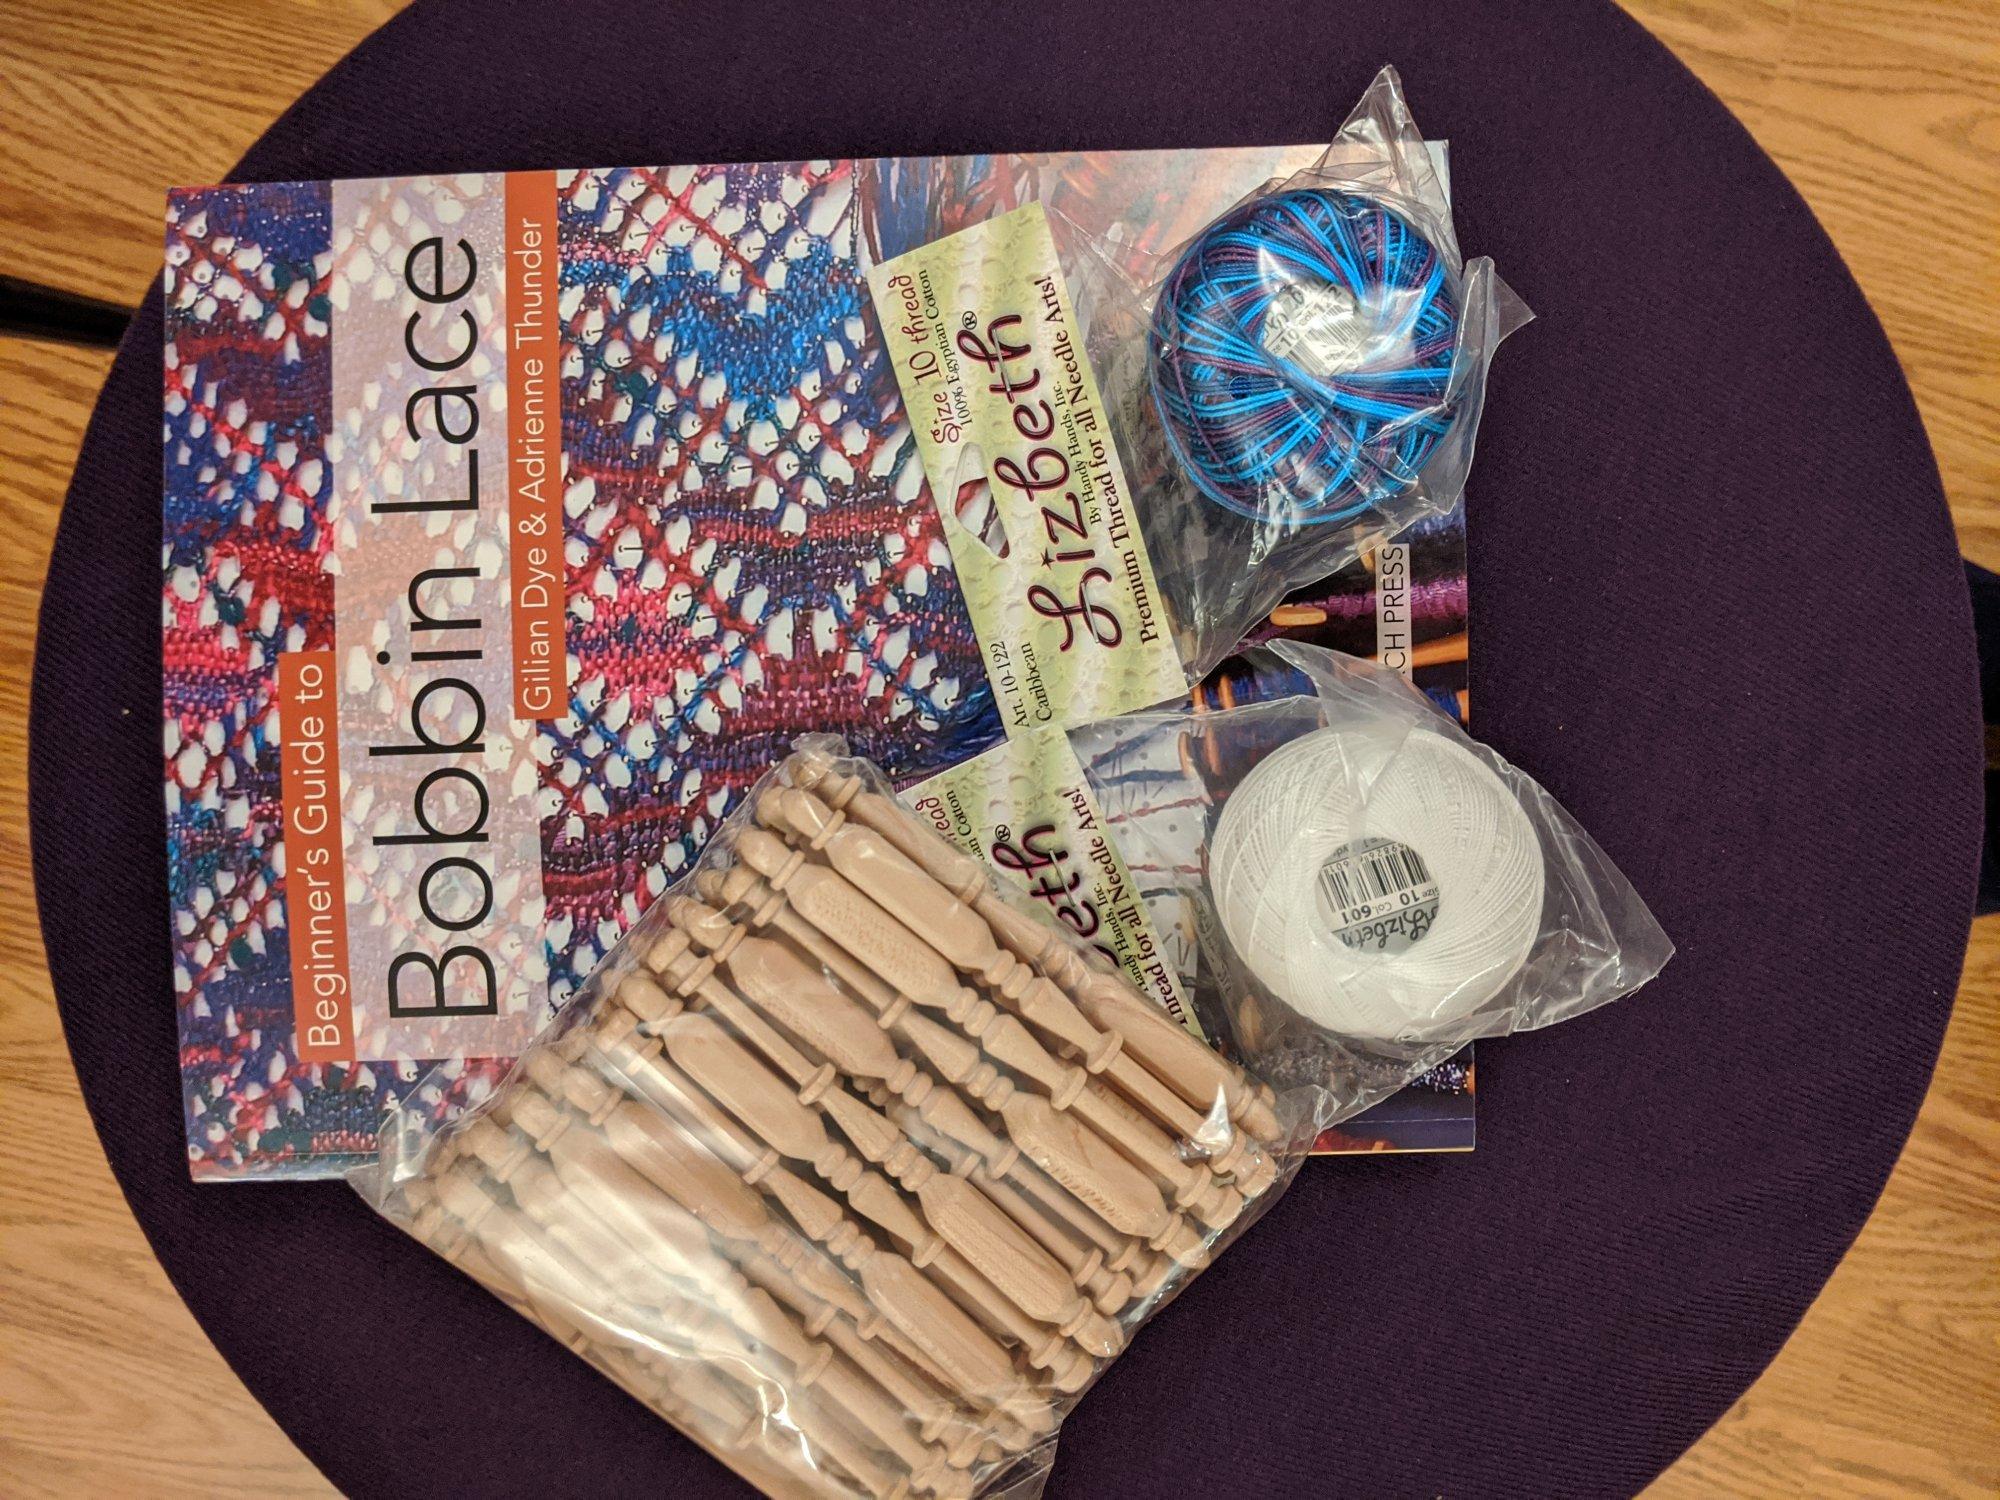 Beginners Bobbin Lace Kit